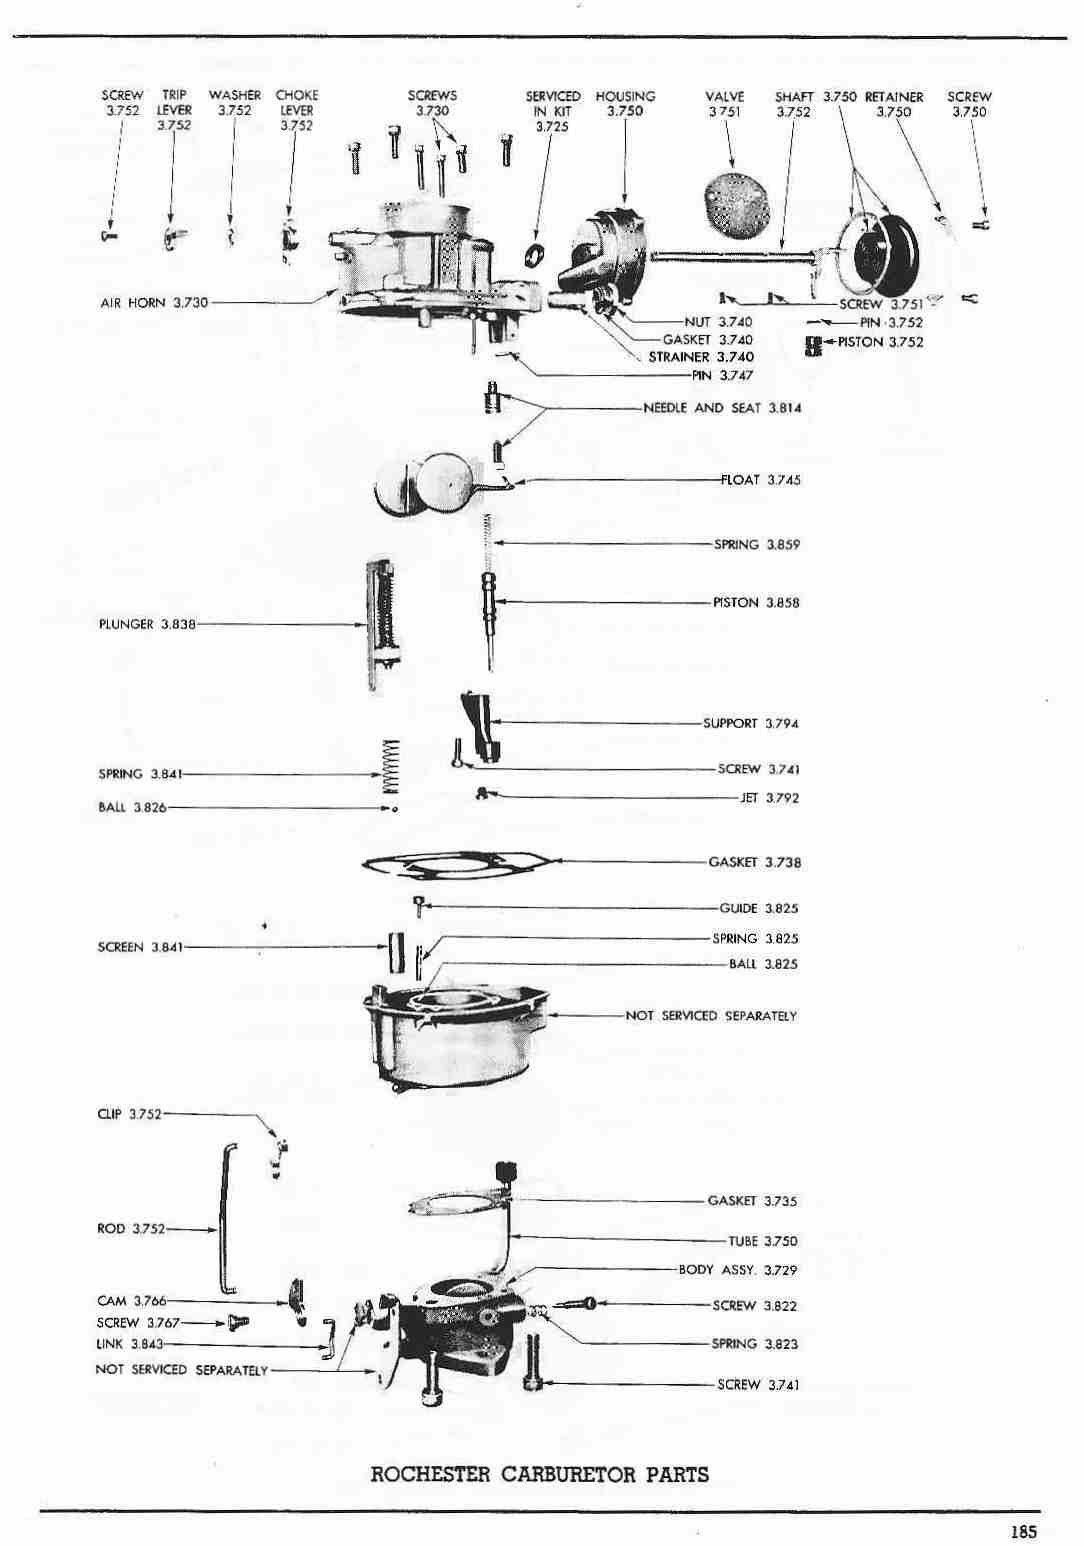 Rochester 1 Barrel Carburetor Diagram : rochester, barrel, carburetor, diagram, Rochester, Barrel, Carburetor, Diagram, Drivenhelios